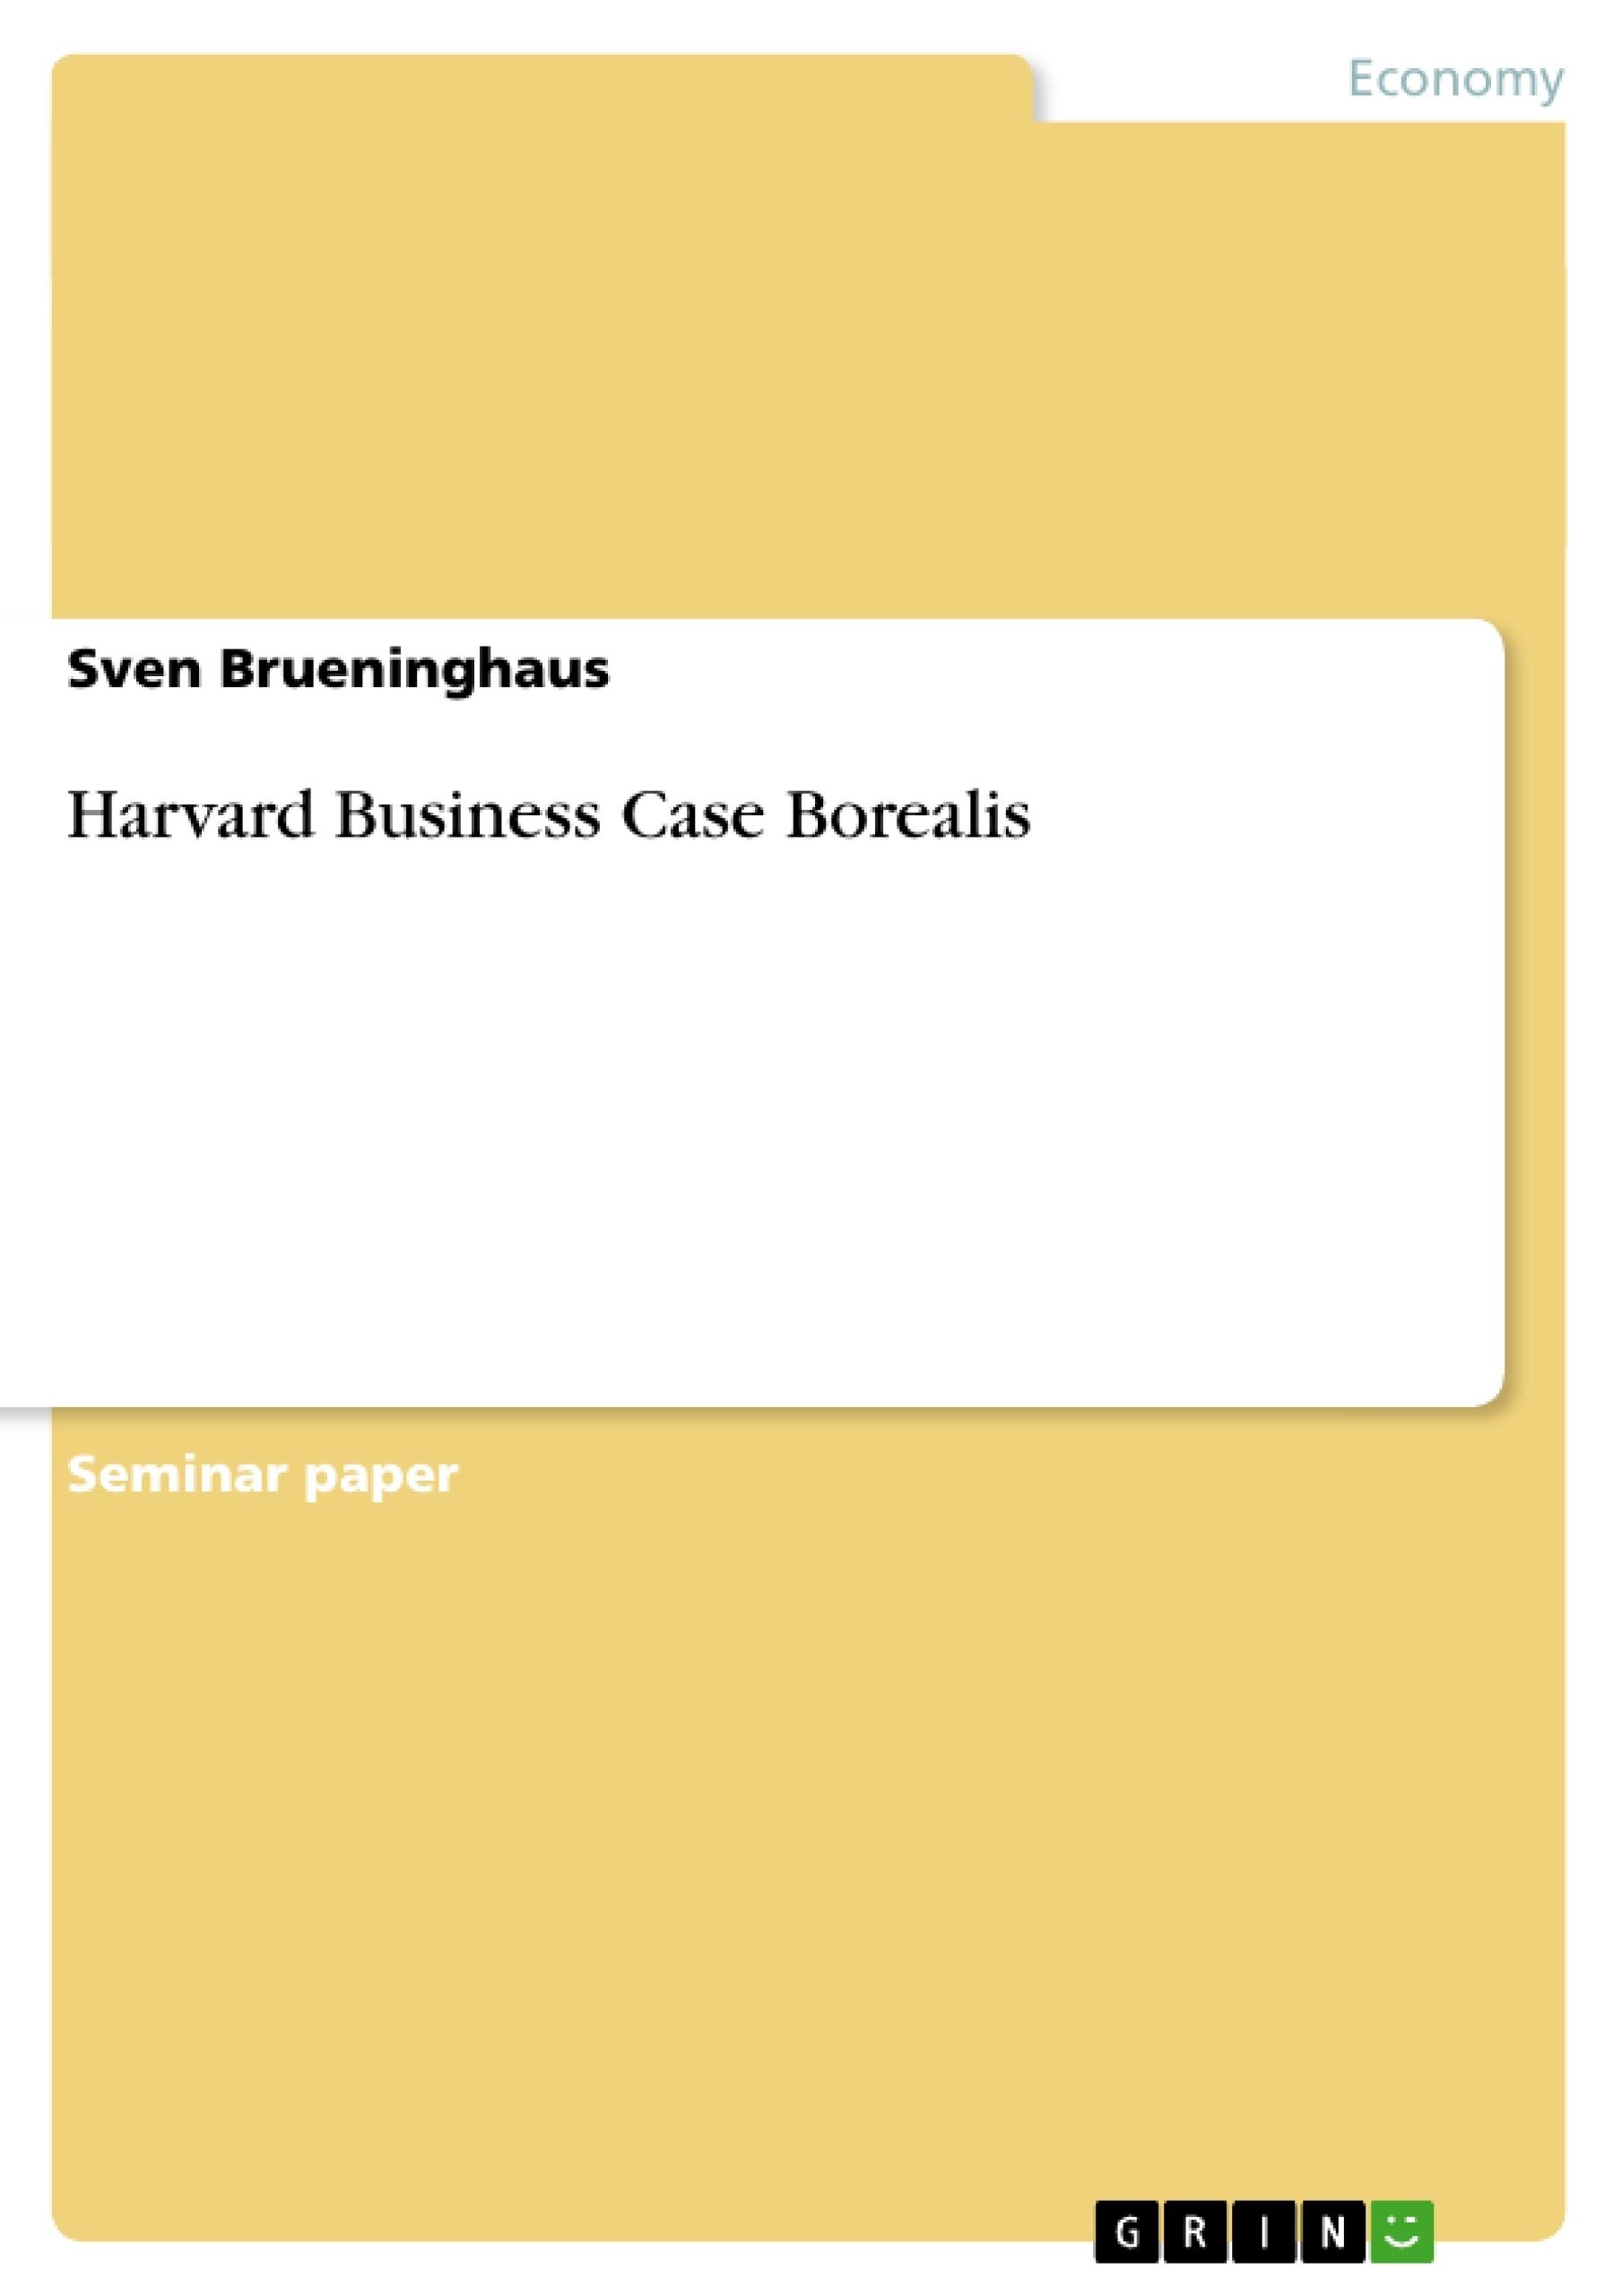 Title: Harvard Business Case Borealis